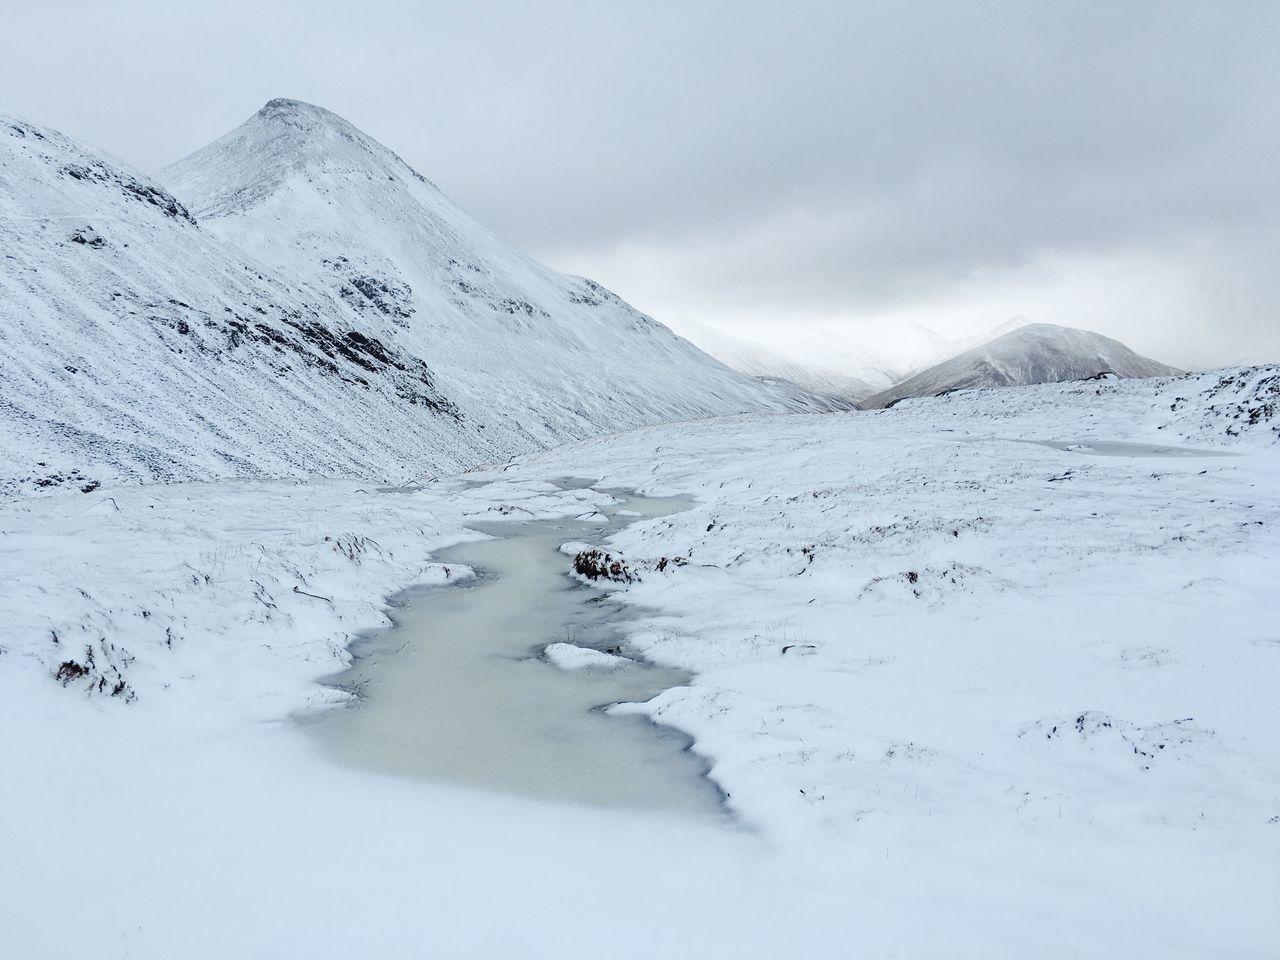 Winter Snow Ice Frozen Mountain Mountains Munro Scotland Highlands Landscape Hiking Trekking Mountaineering Uk Kinlochleven Binnein Beag Binnein Beag, Scotland, UK